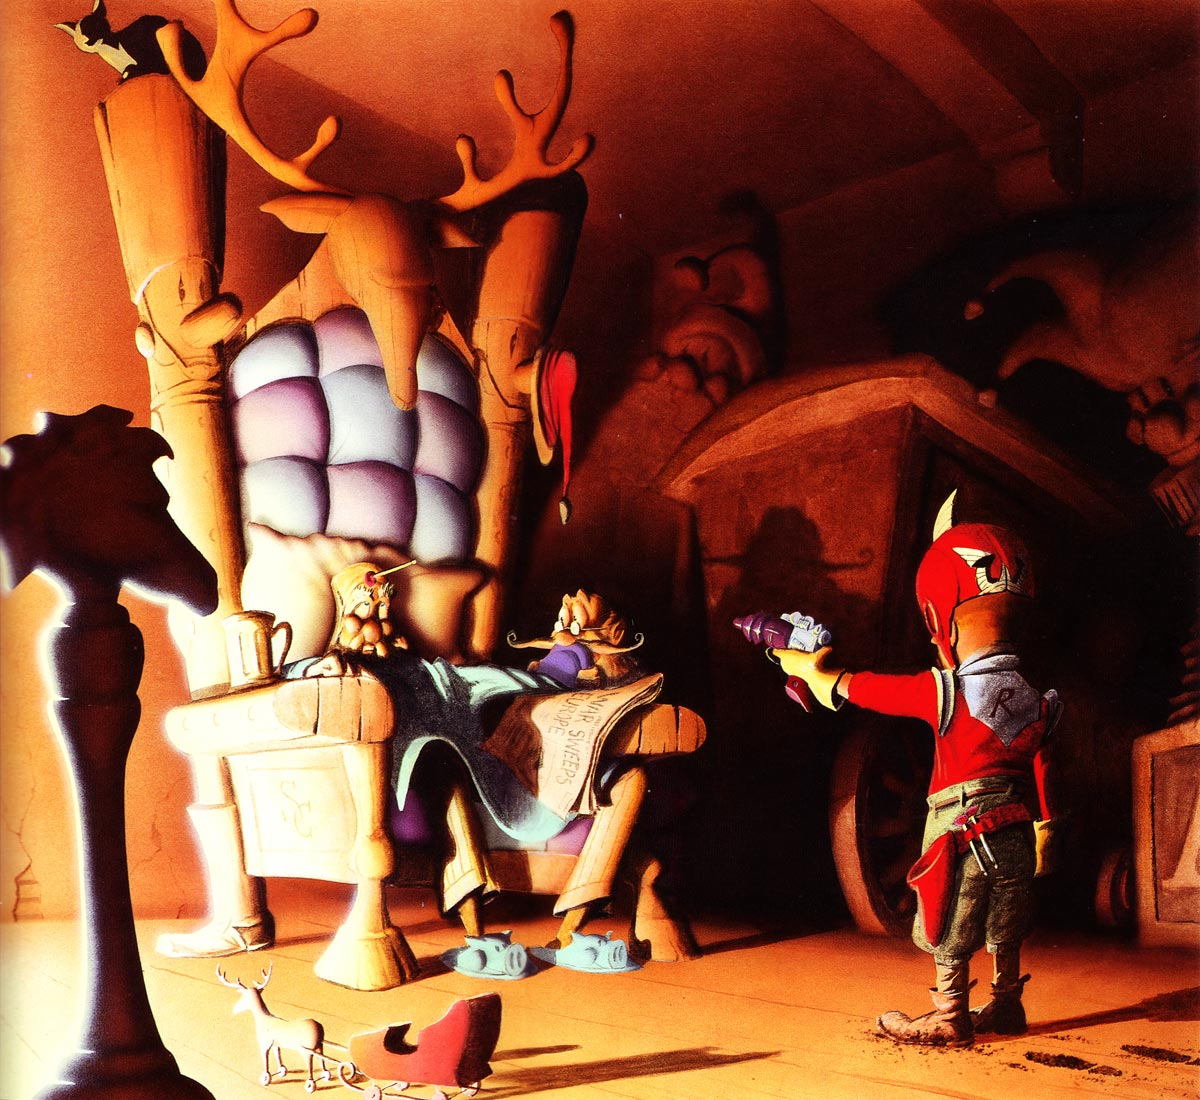 Red confronts Saunder Saunder Clös.